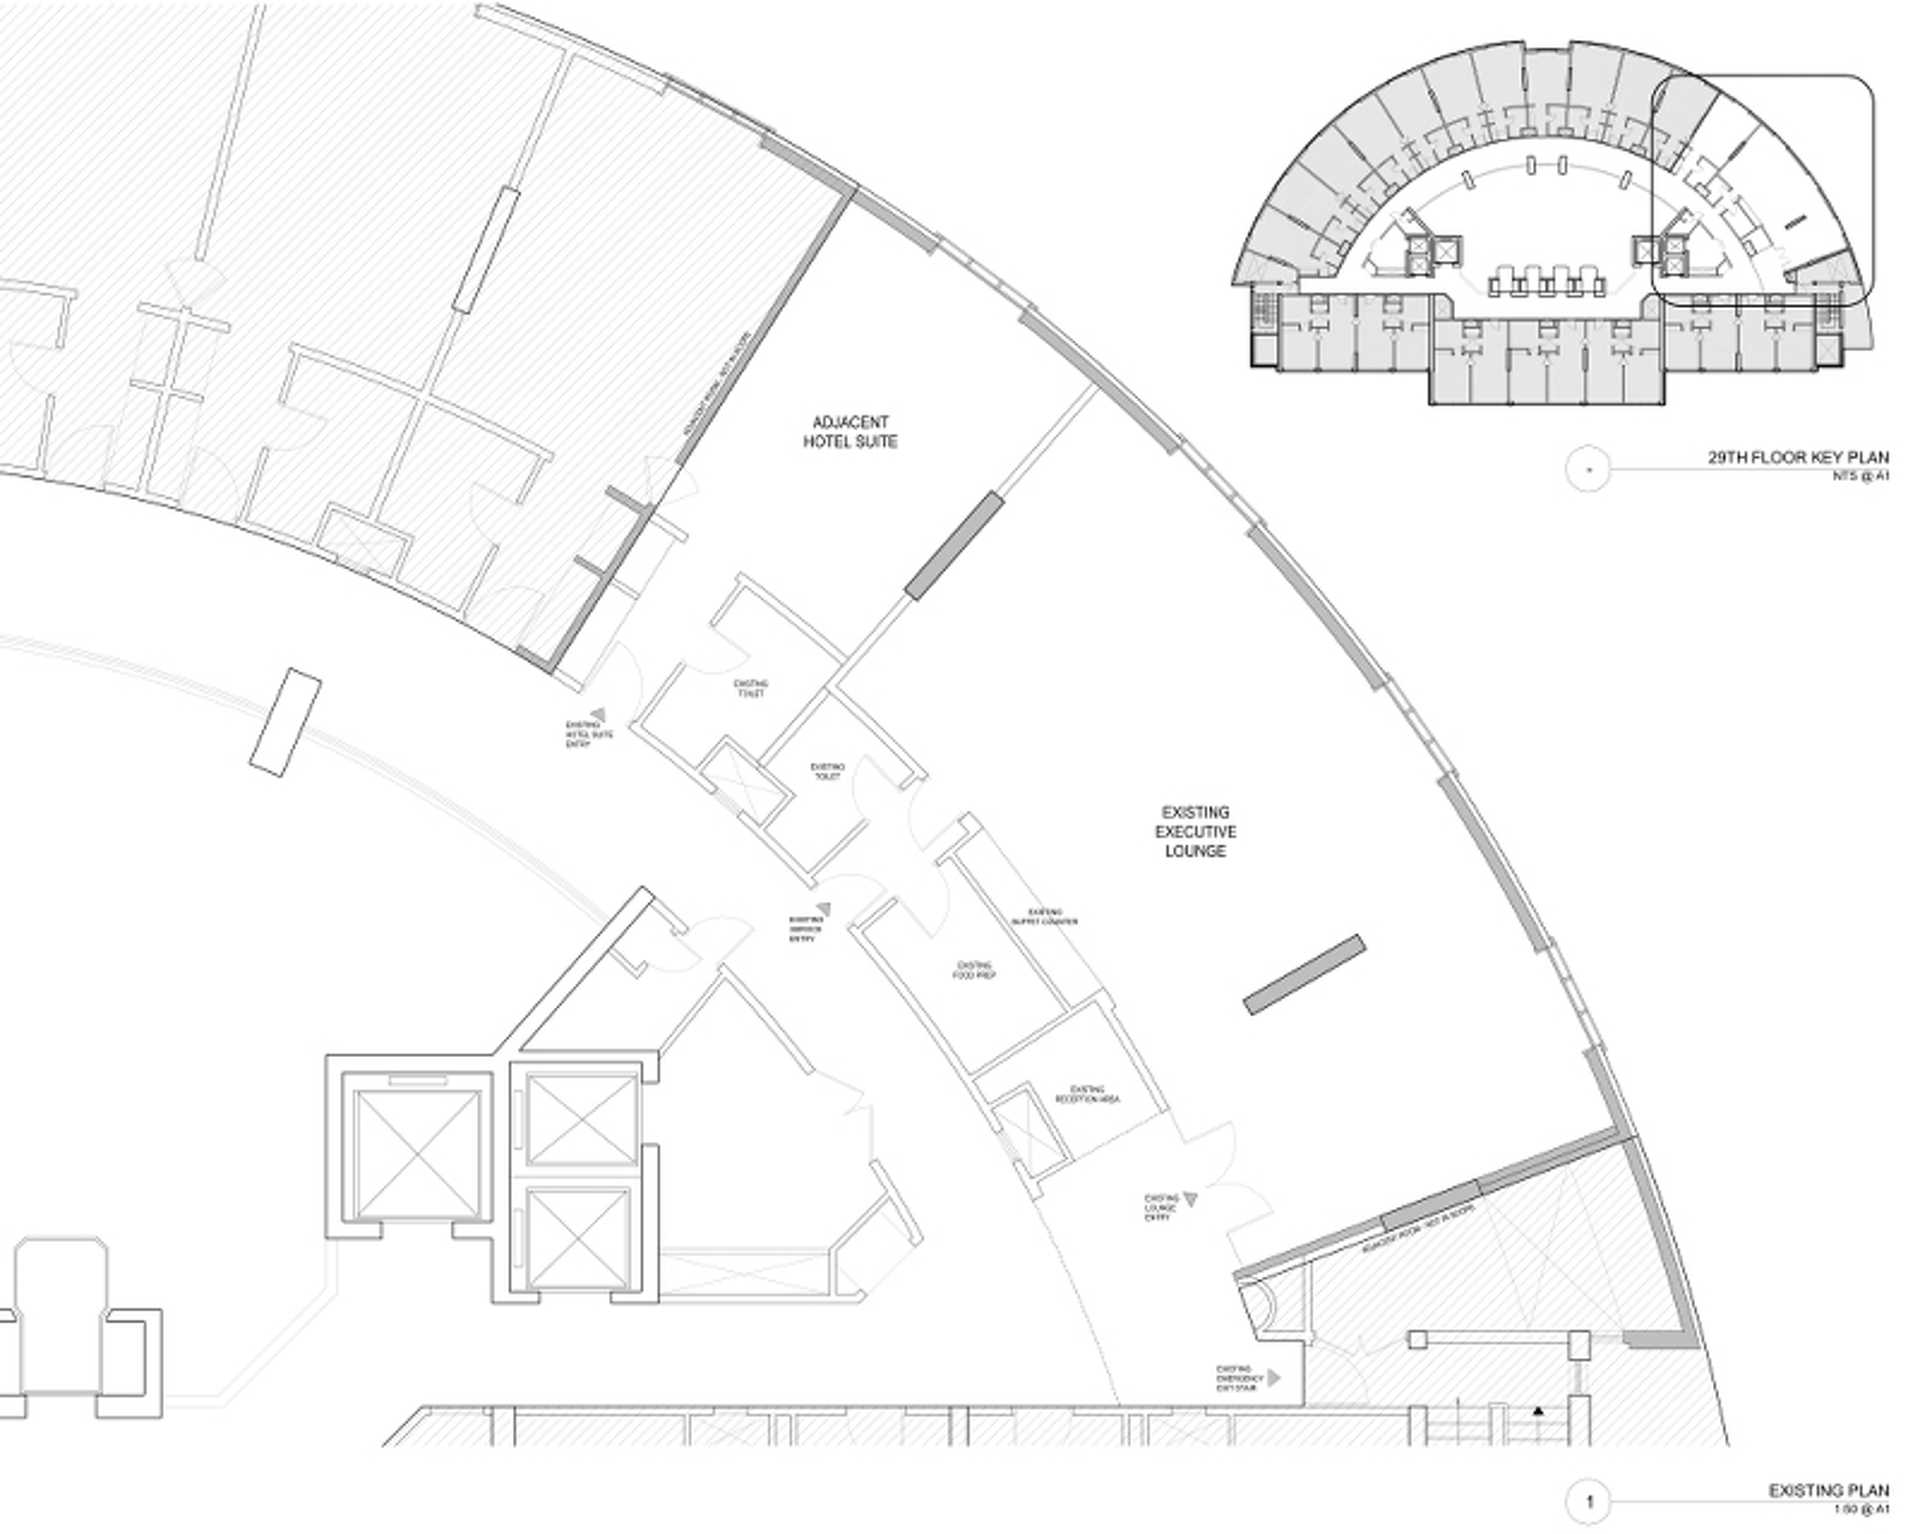 Hilton Executive Lounge Existing Plan